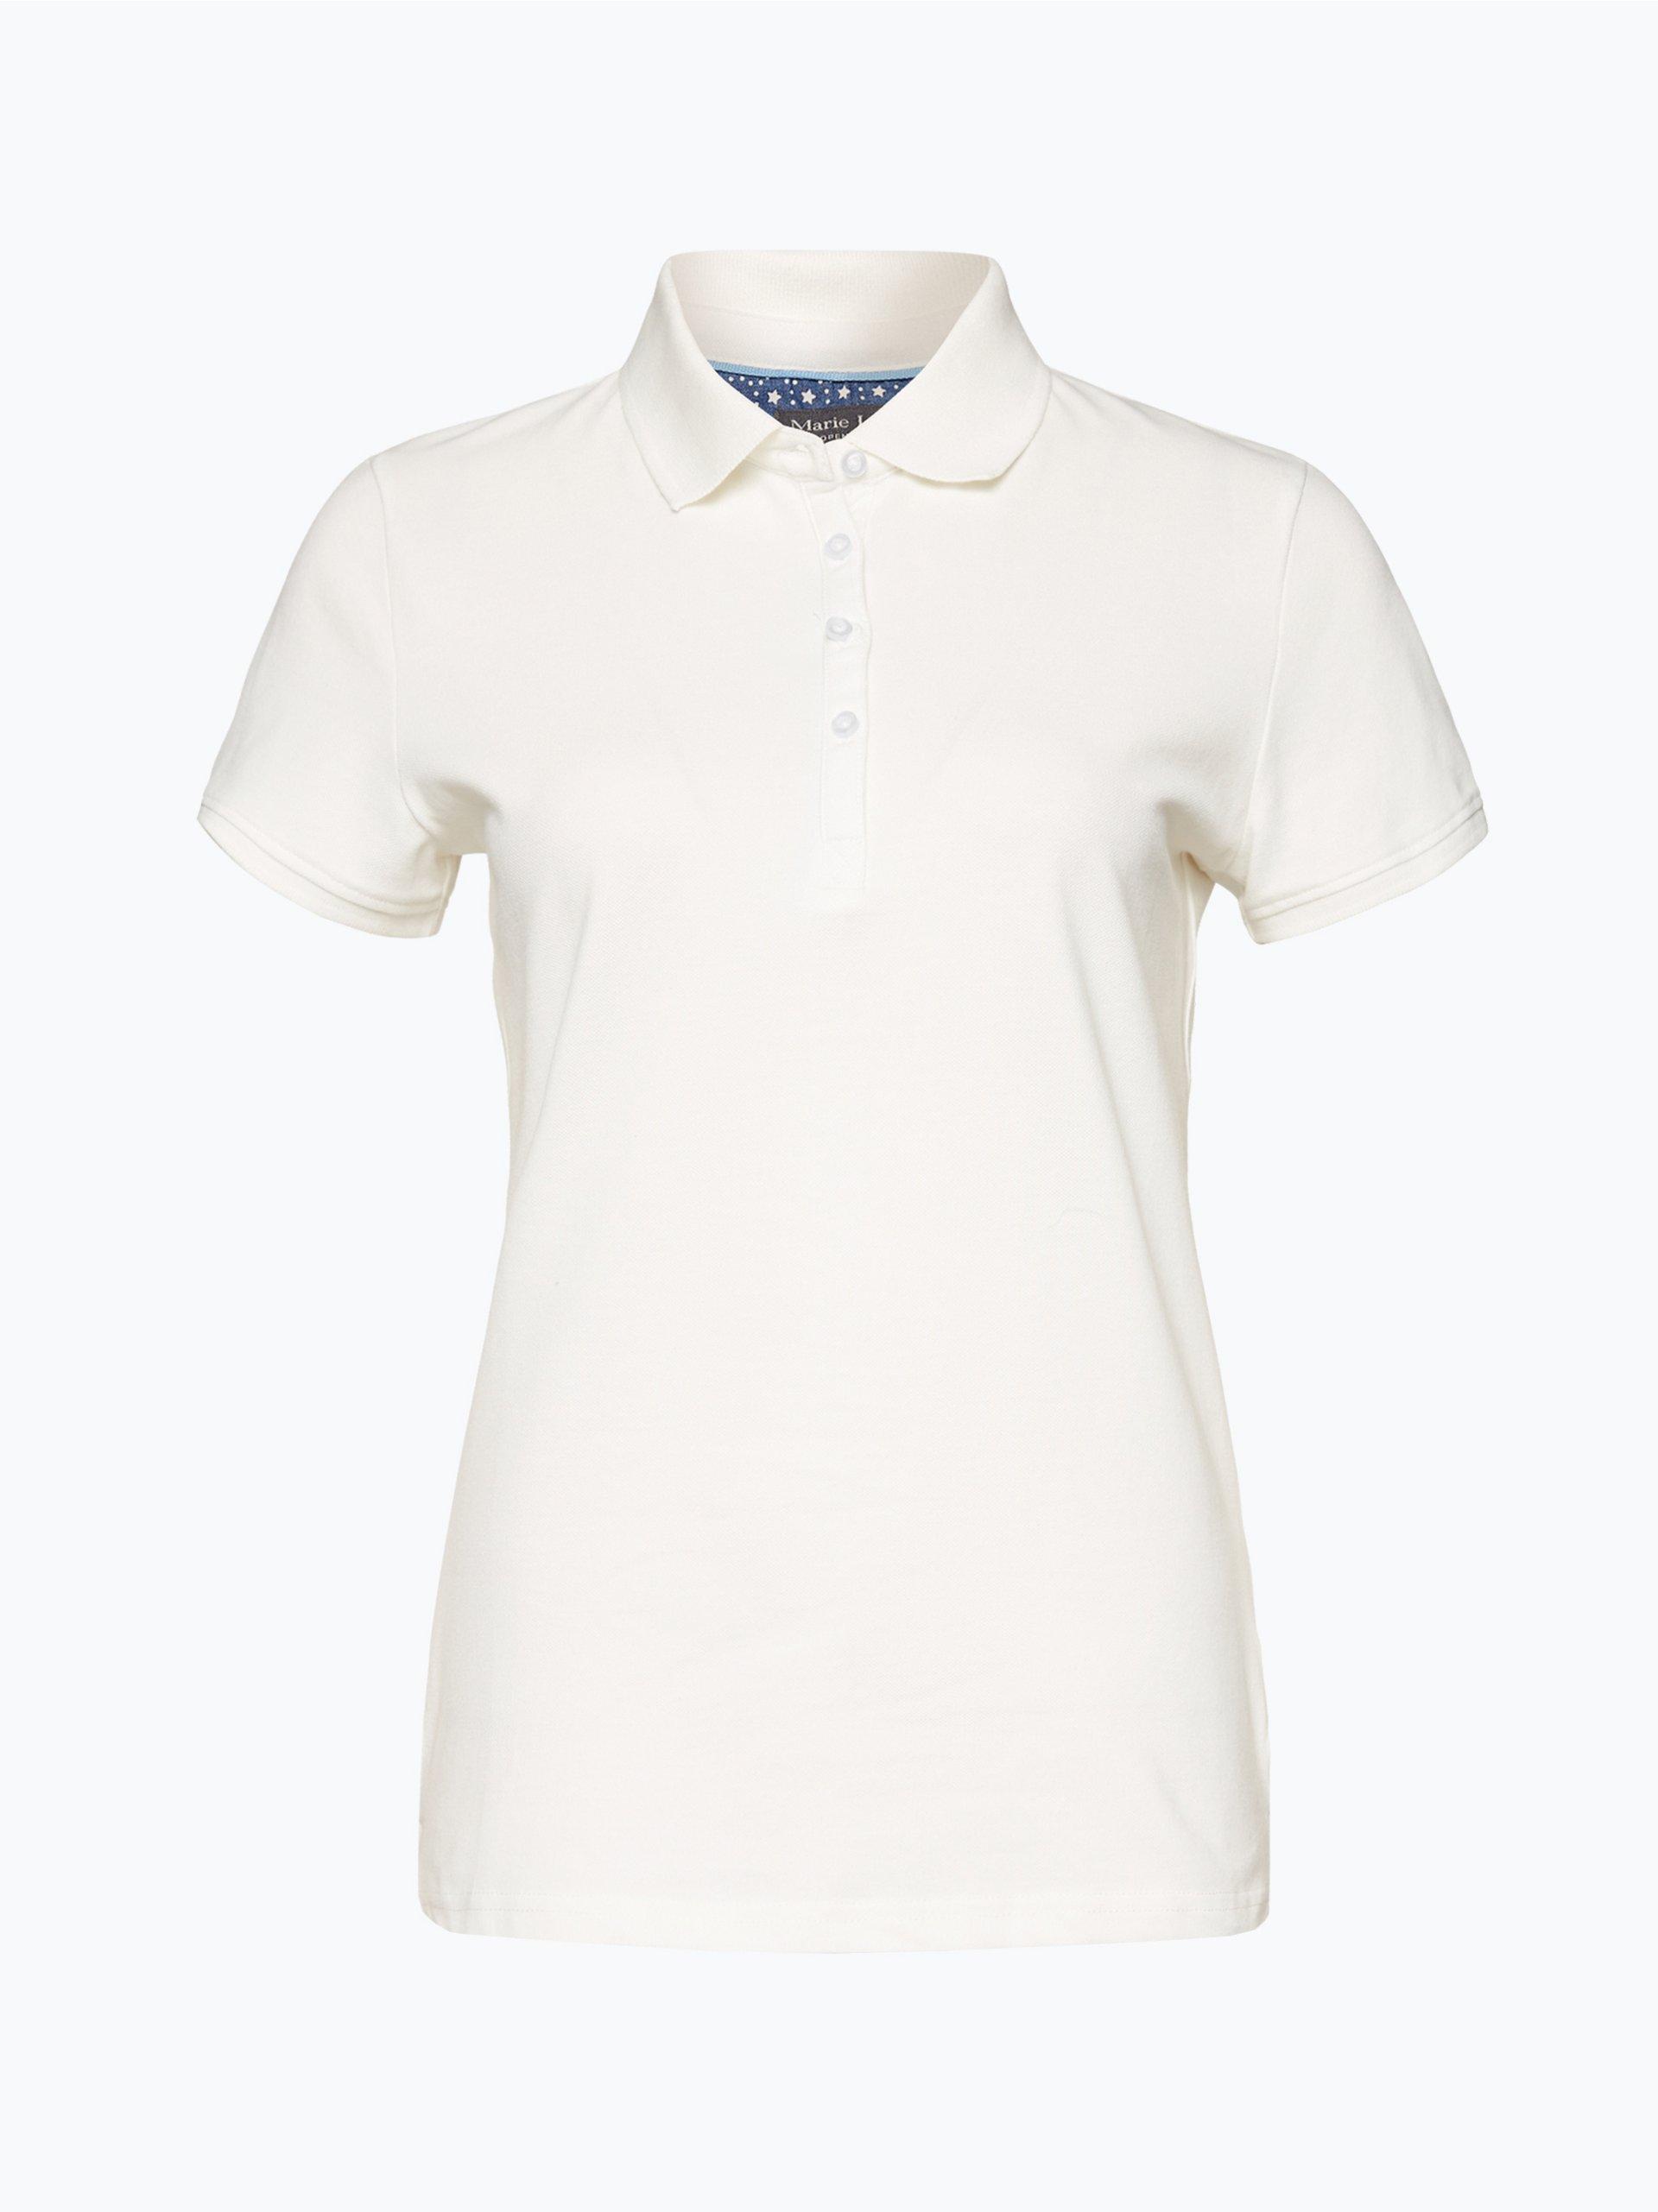 Marie Lund Damen Poloshirt